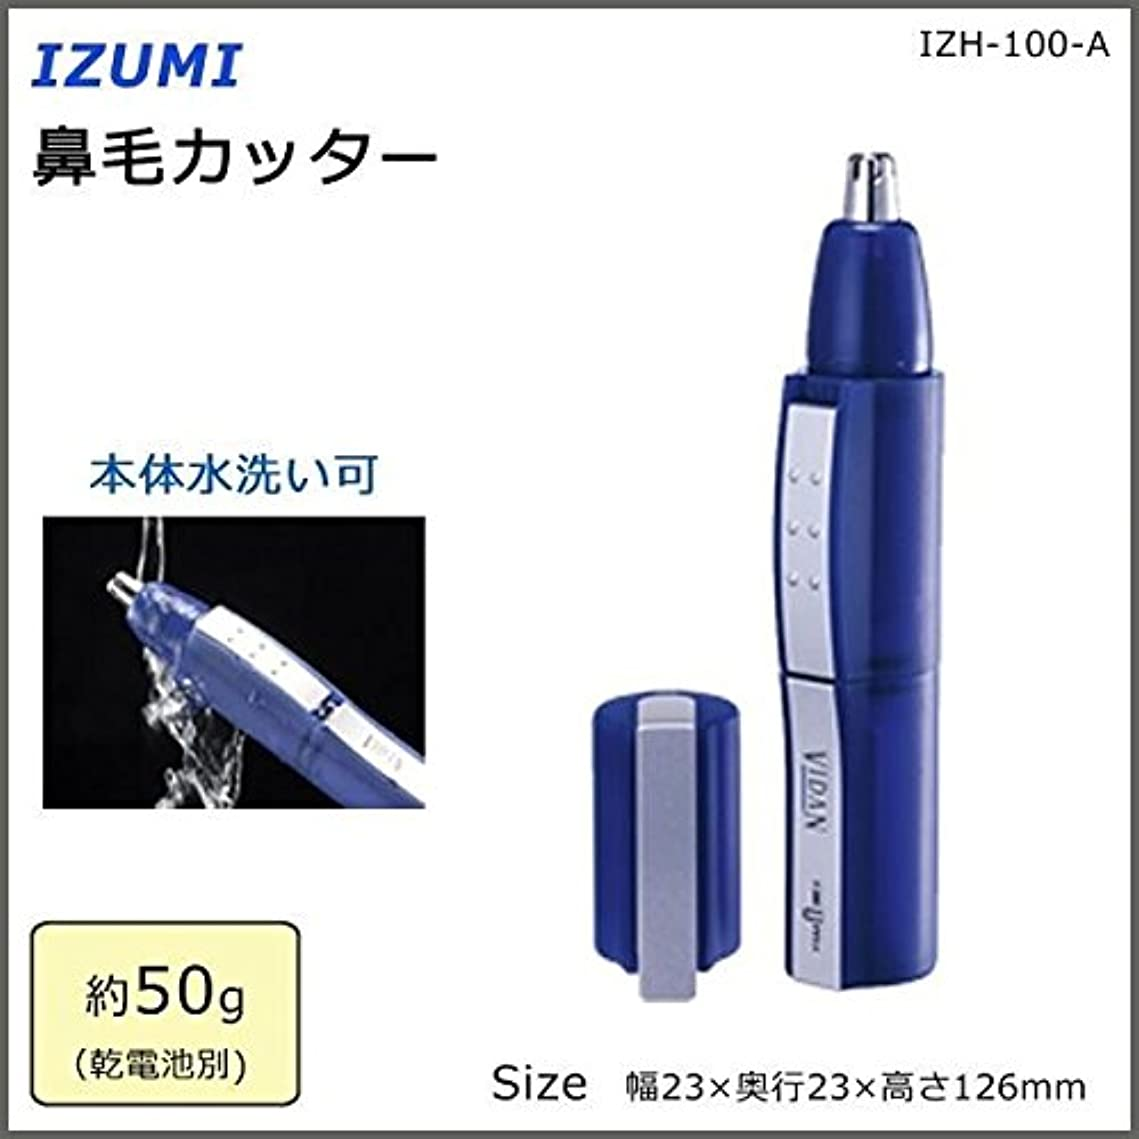 洞察力粒子花輪IZUMI 鼻毛カッター IZH-100-A